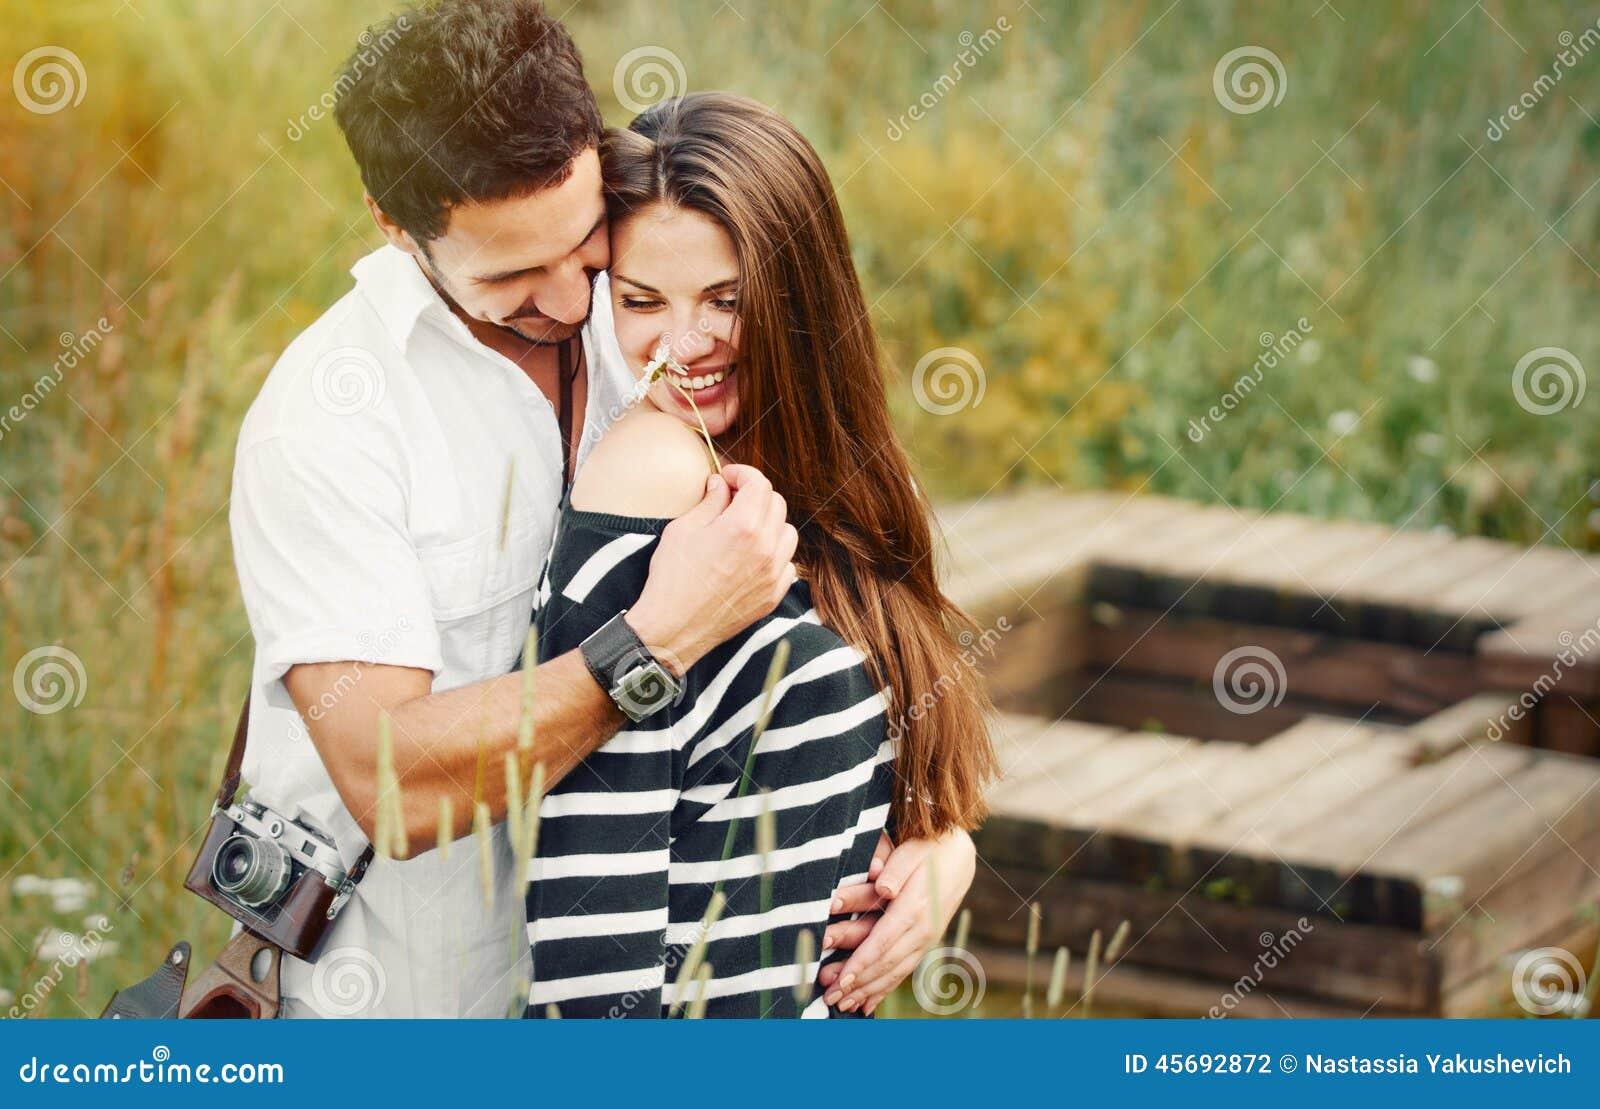 Happy Romantic Couple In Love And Having Fun With Daisy, Beauty Stock ...